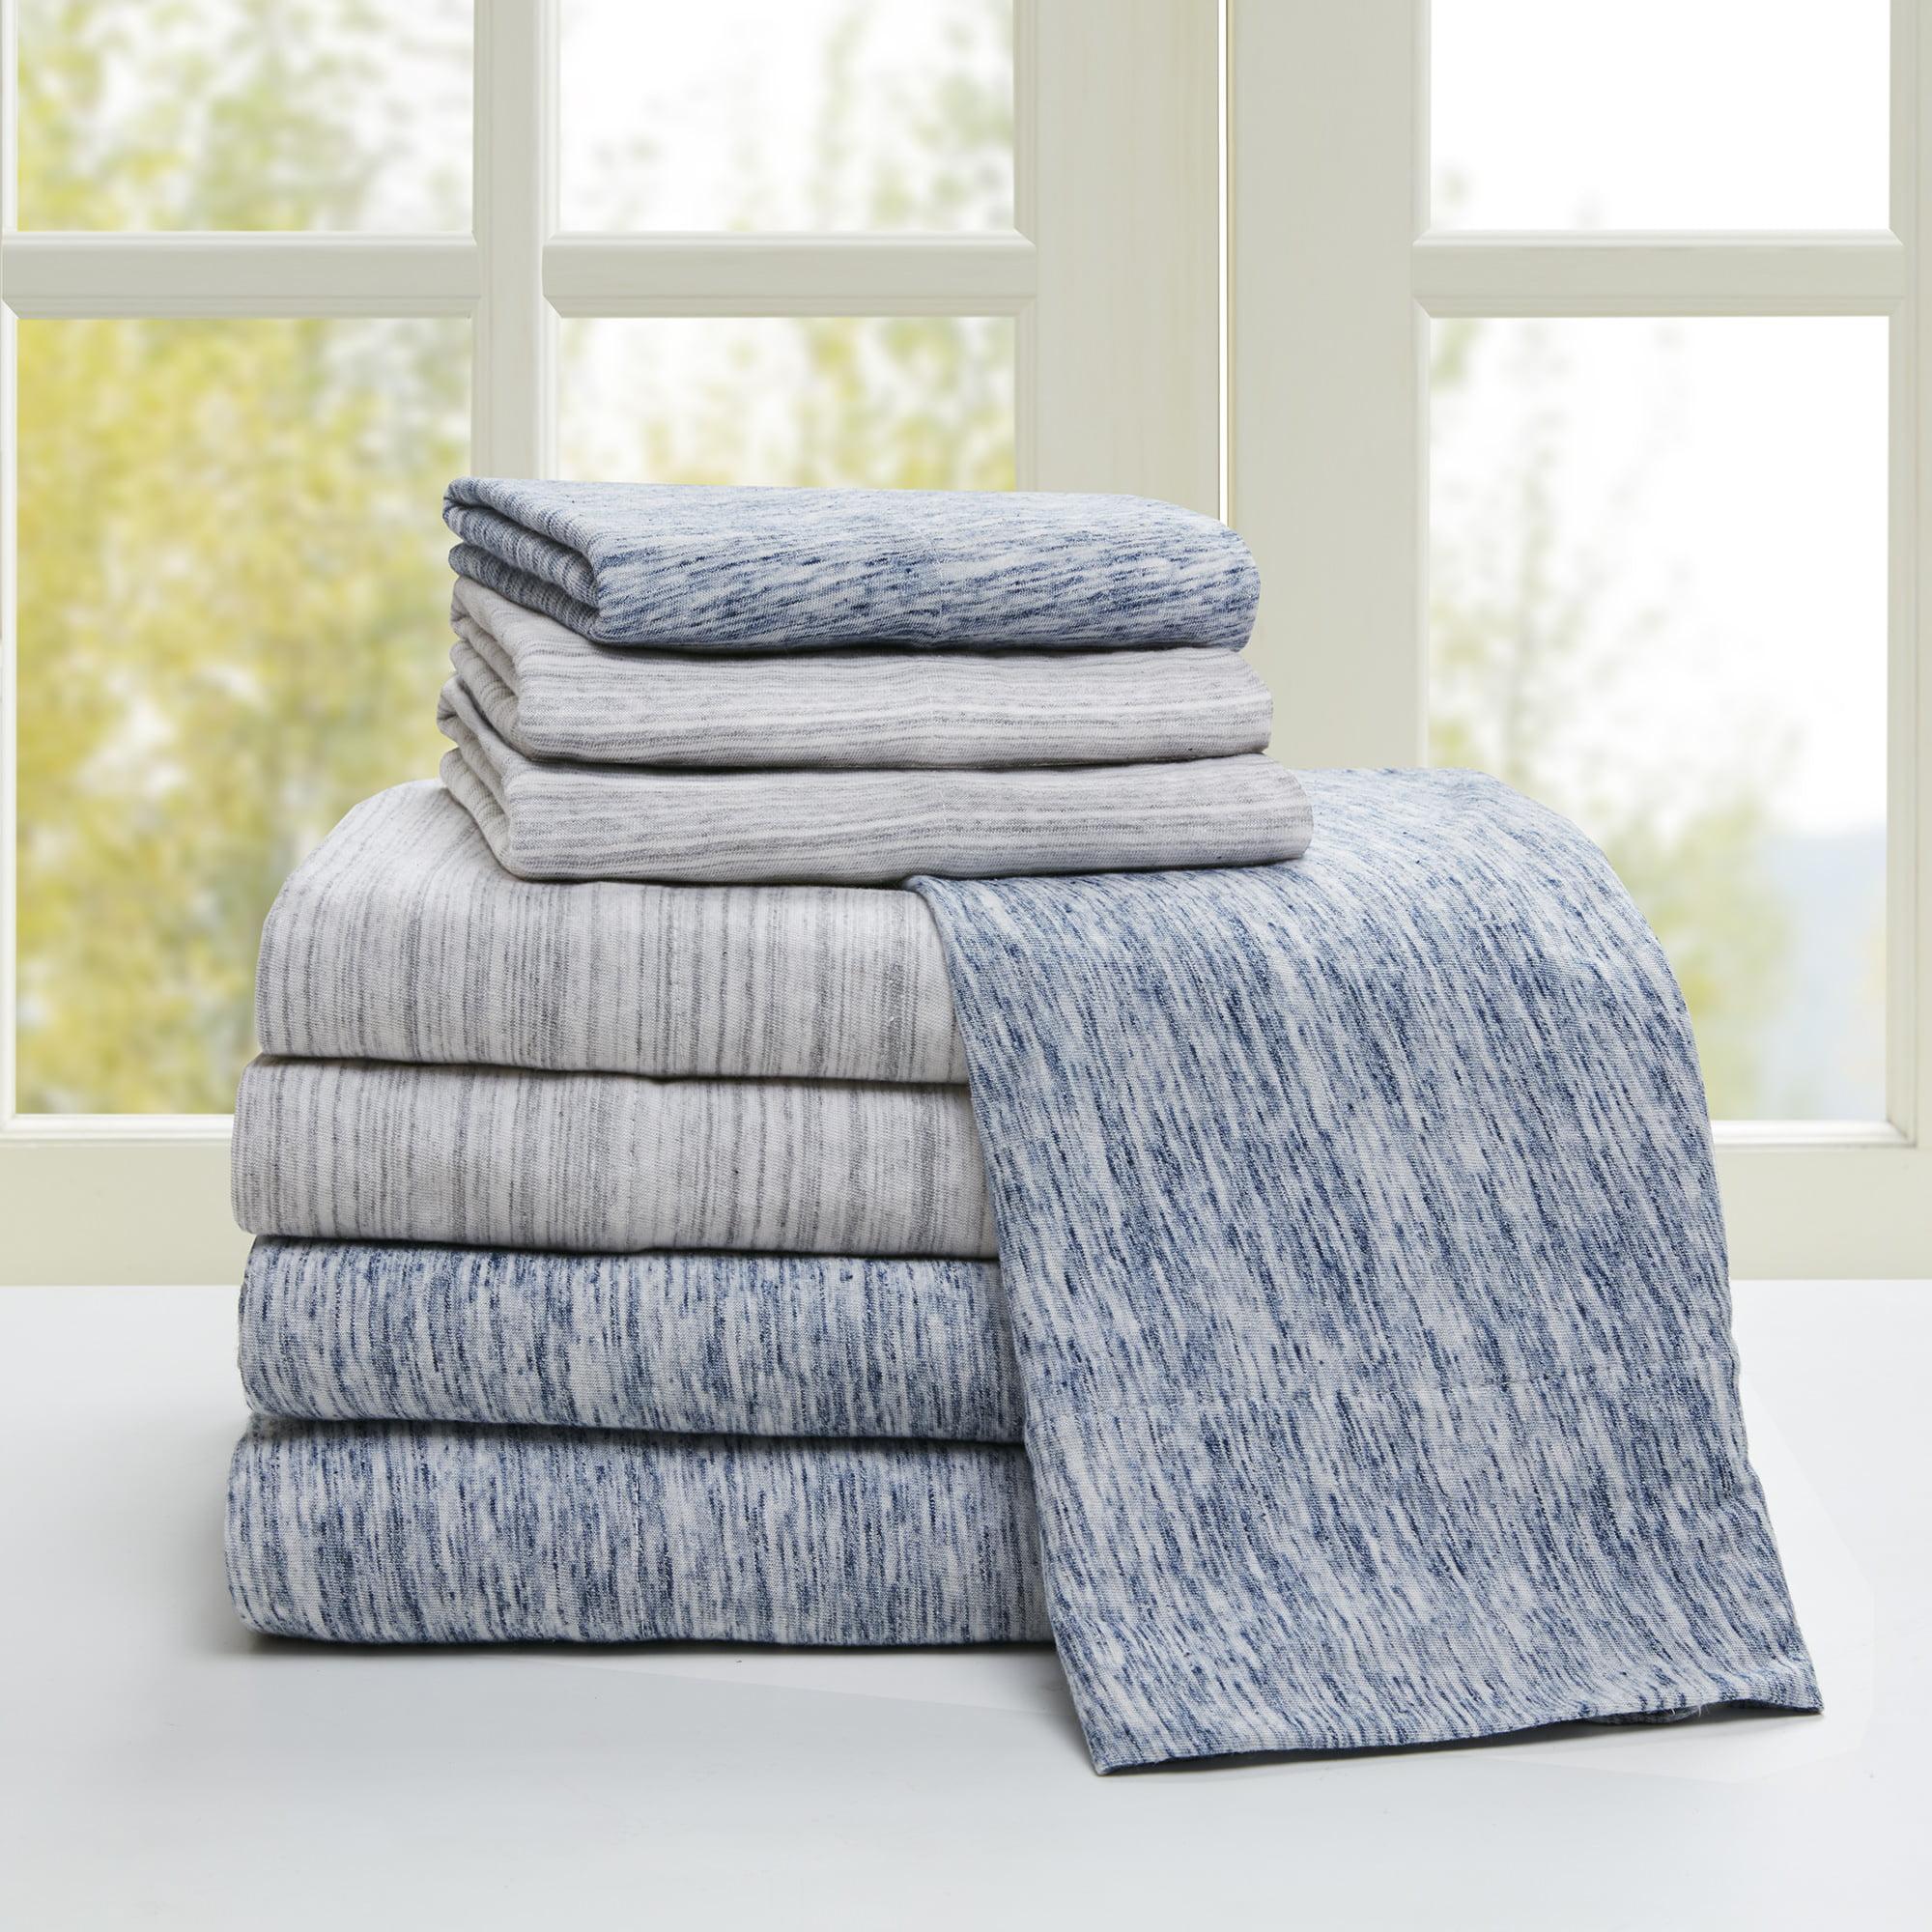 Comfort Classics Space Dyed Cotton Jersey Knit Sheet Set